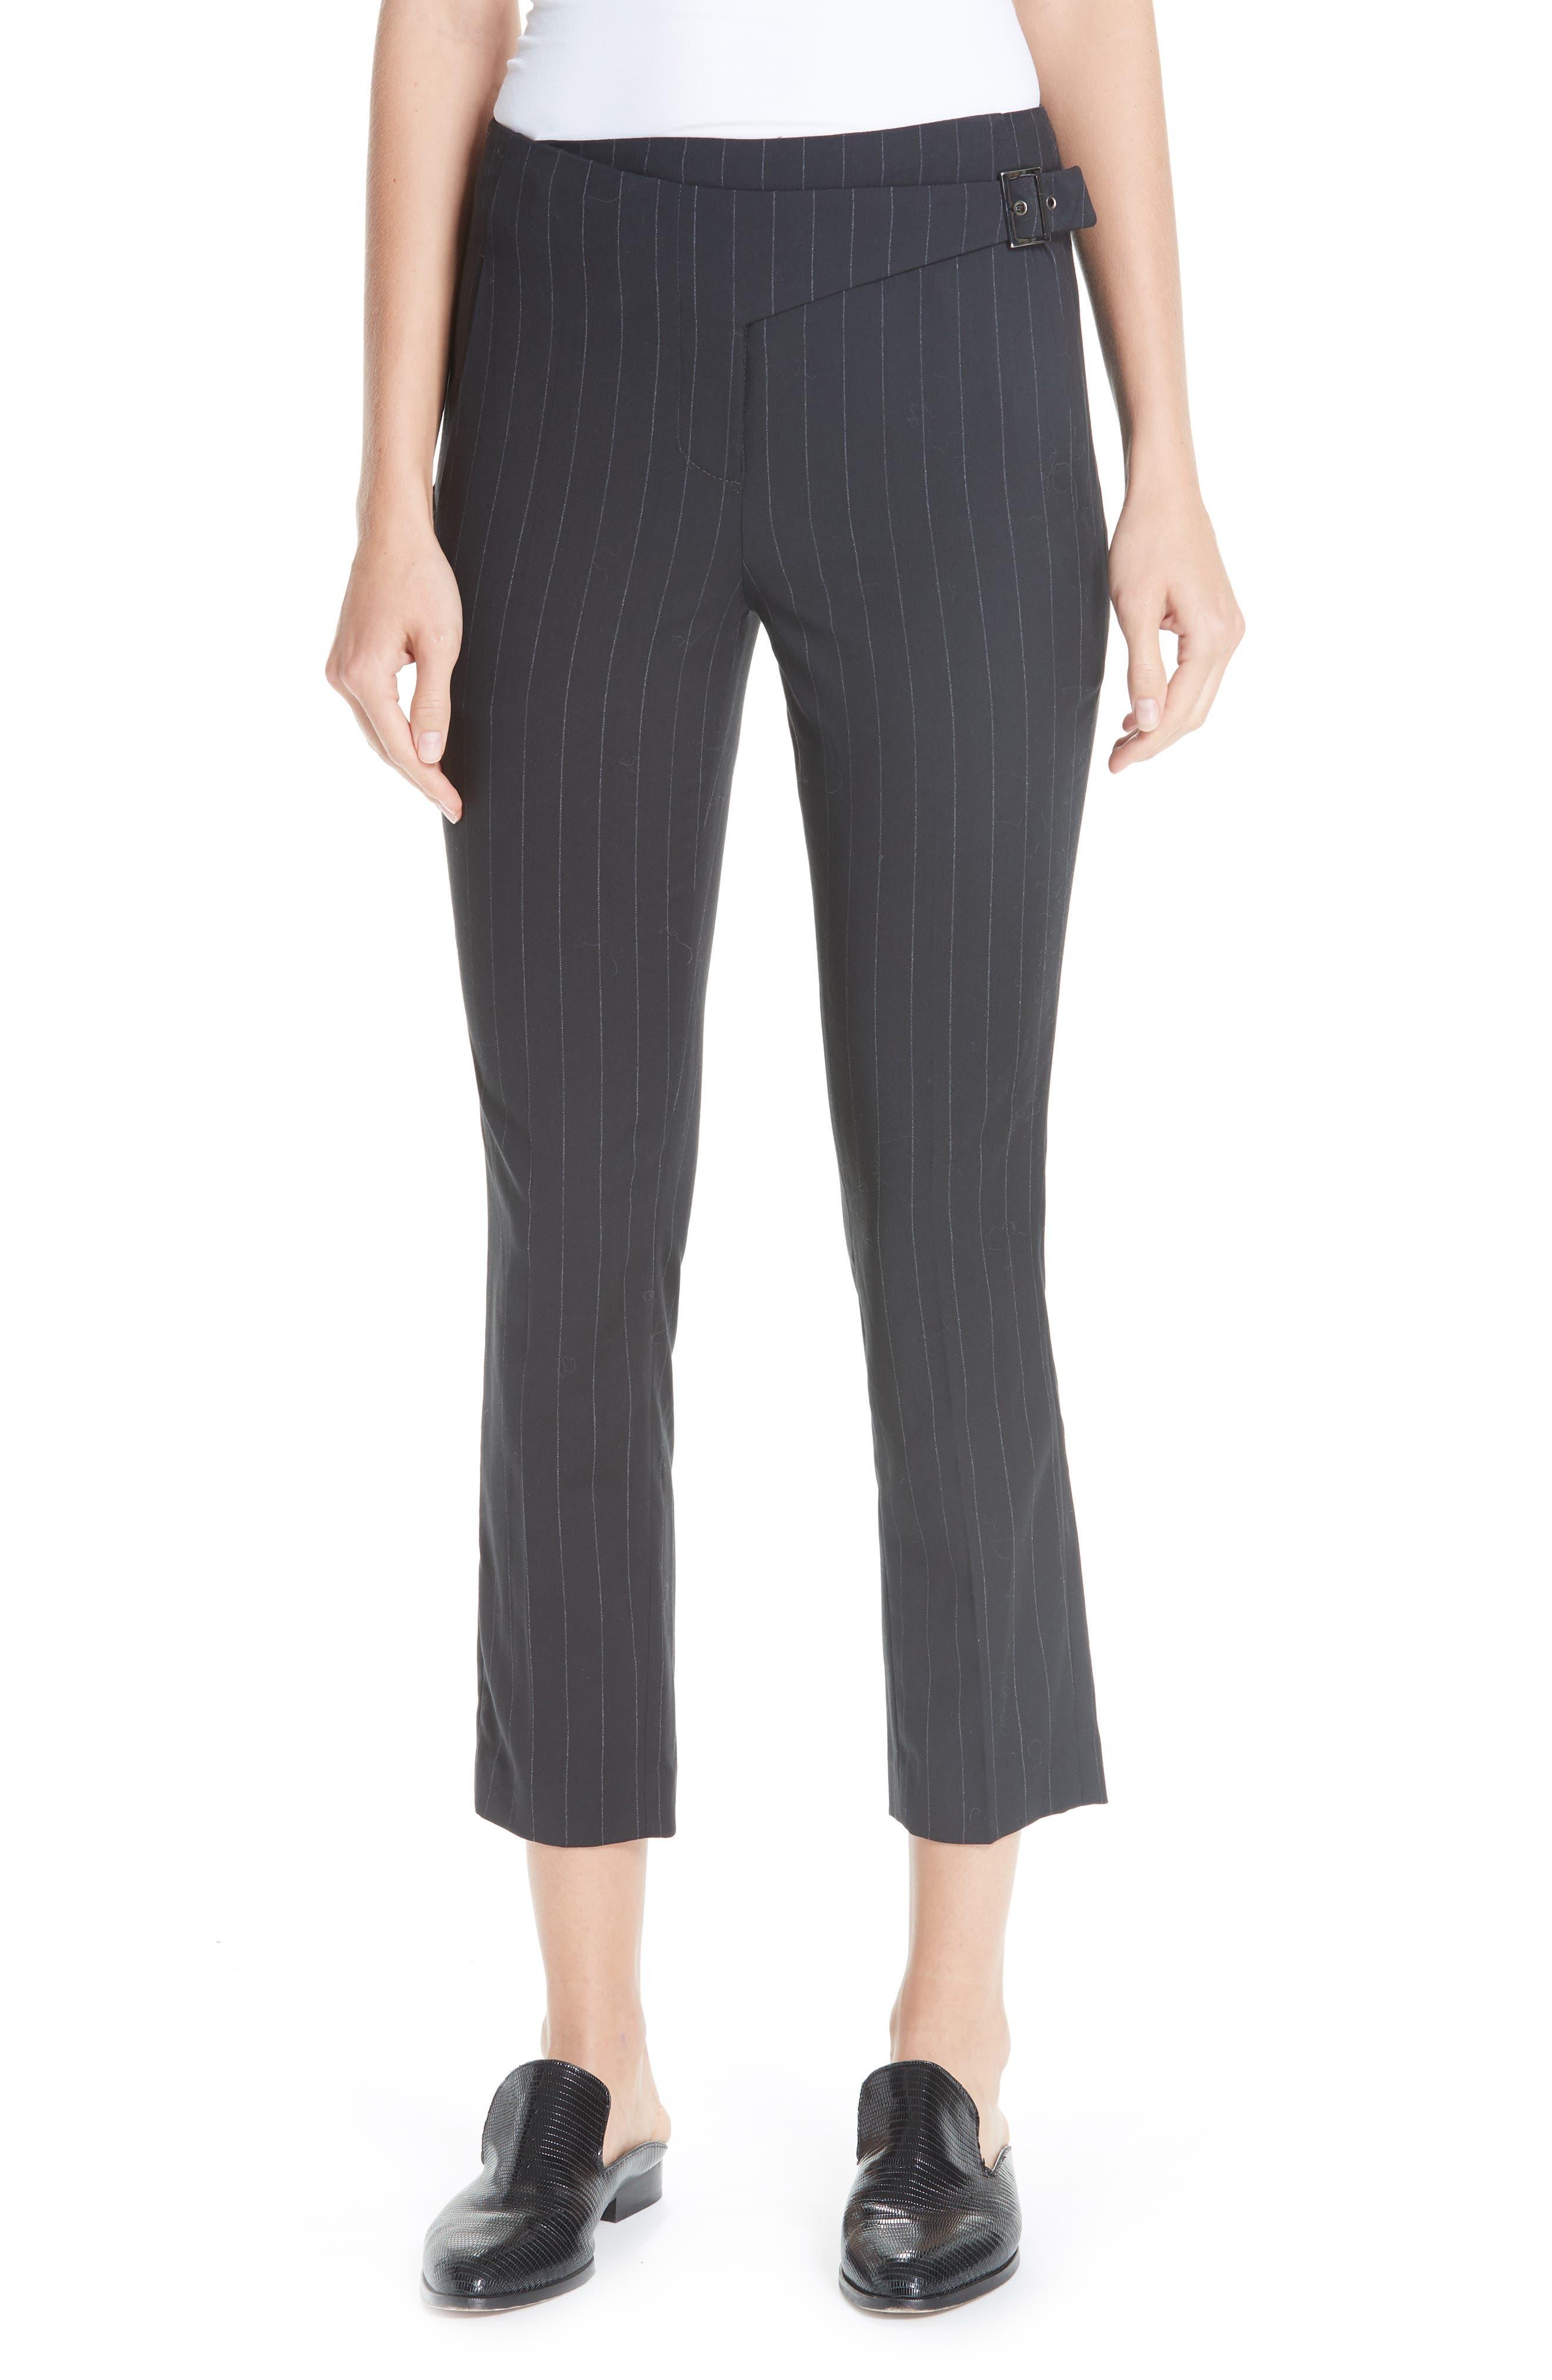 Bango Pinstripe Crop Trousers,                         Main,                         color, 001